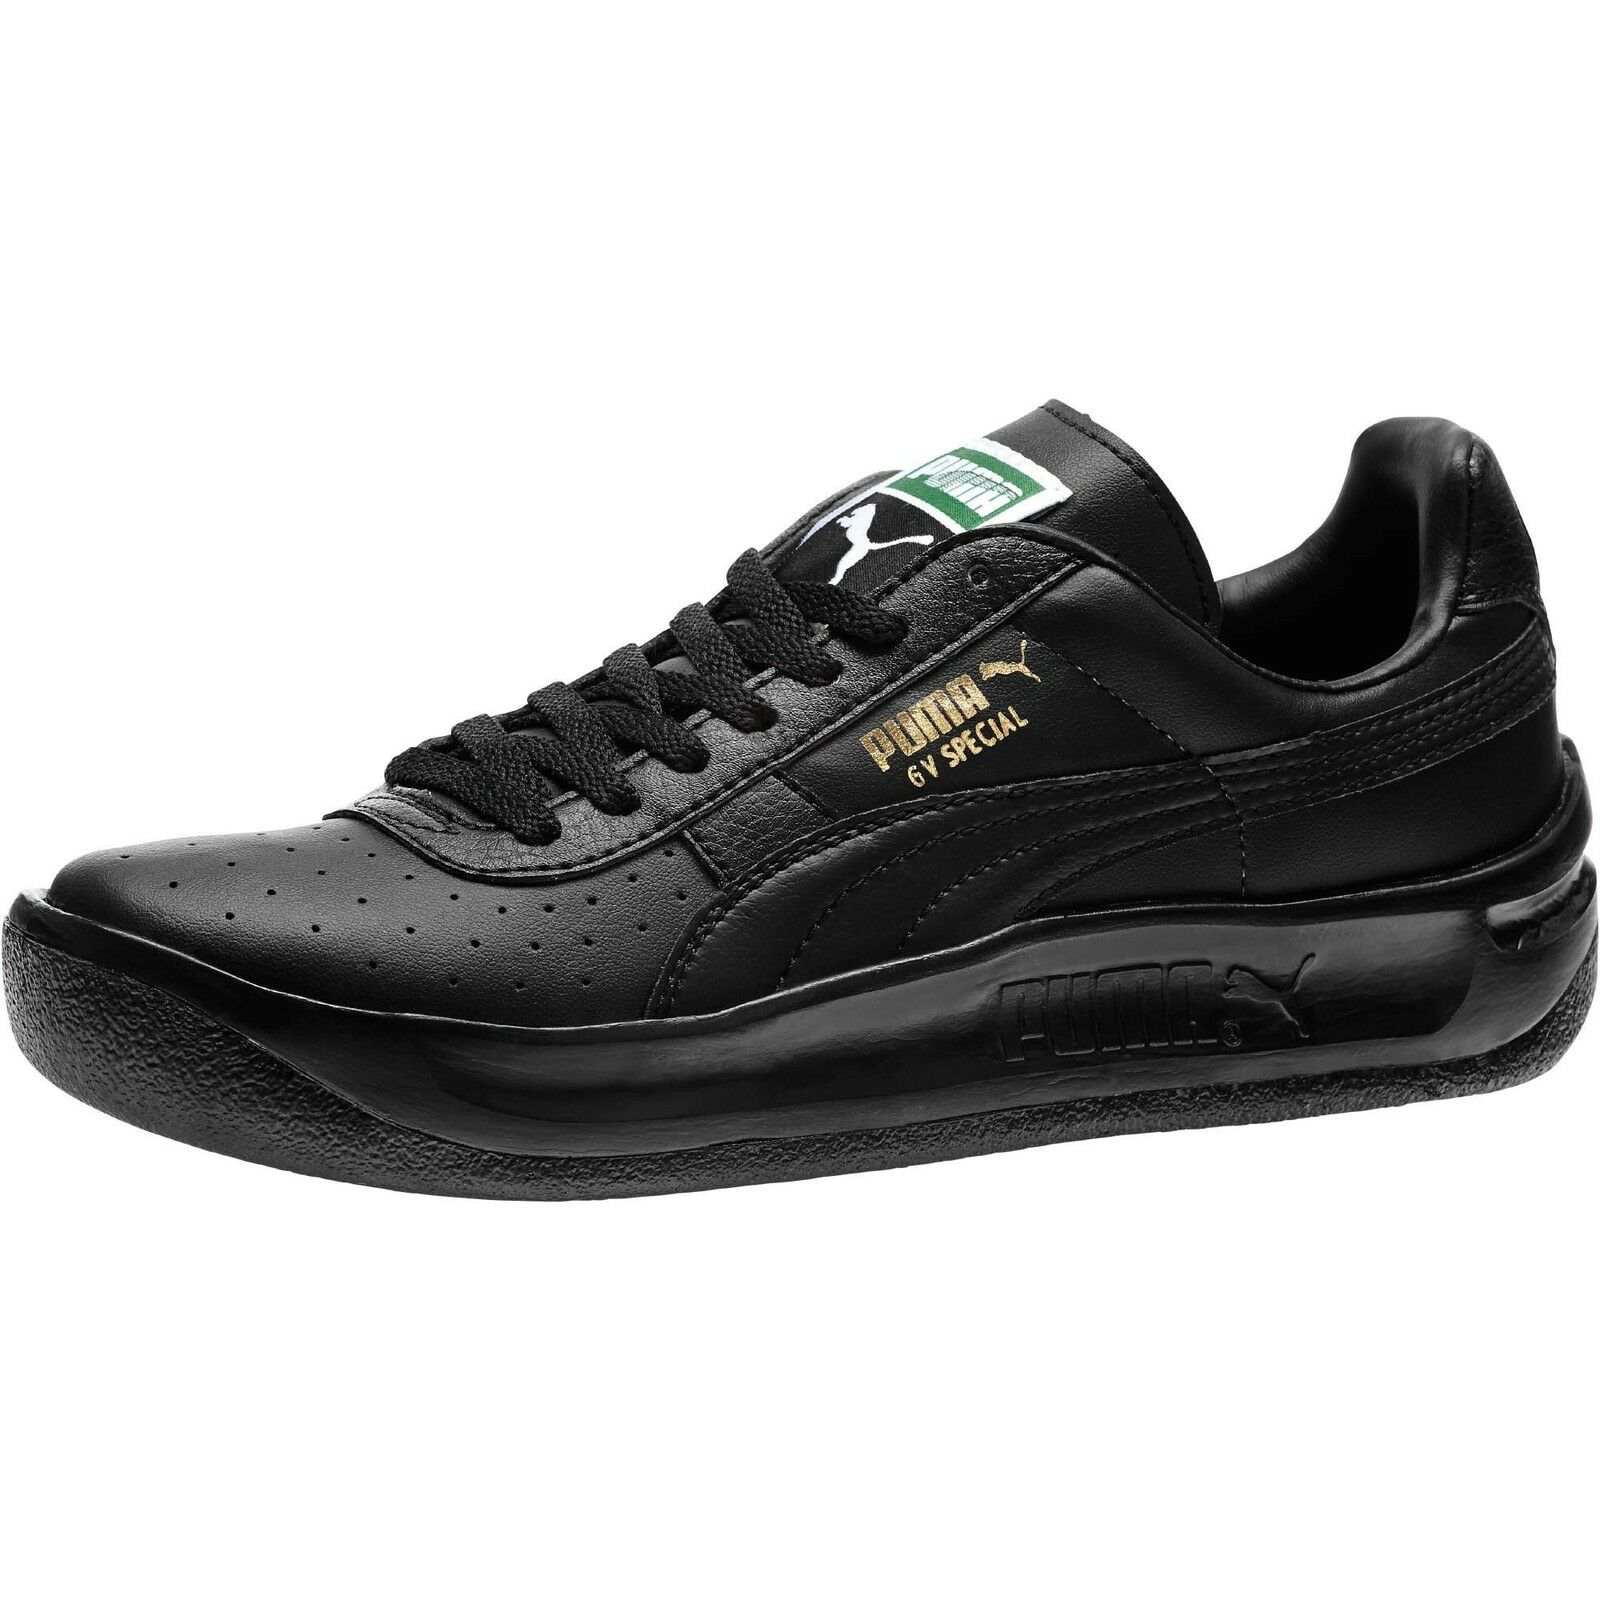 Puma Homme GV Special Jr Chaussures Noir 344765